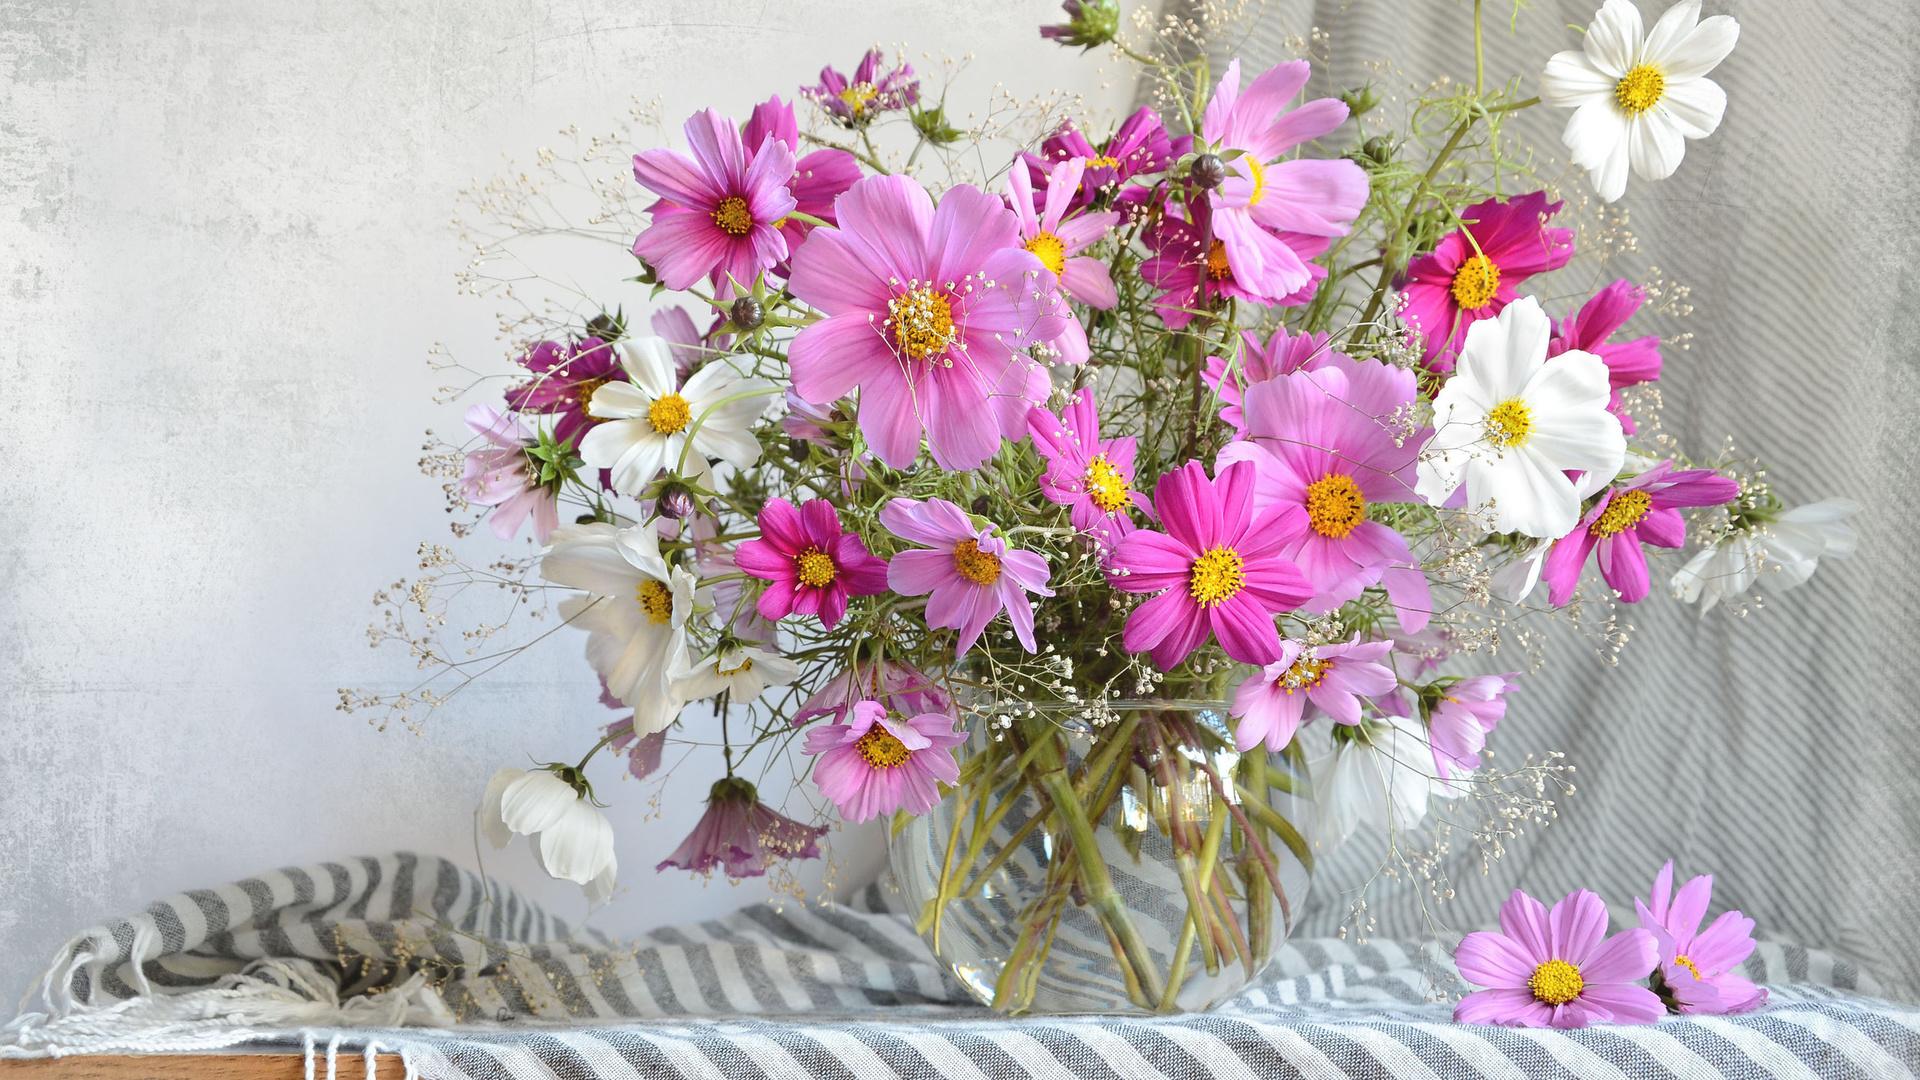 цветы лета в вазах картинки кухонного фартука